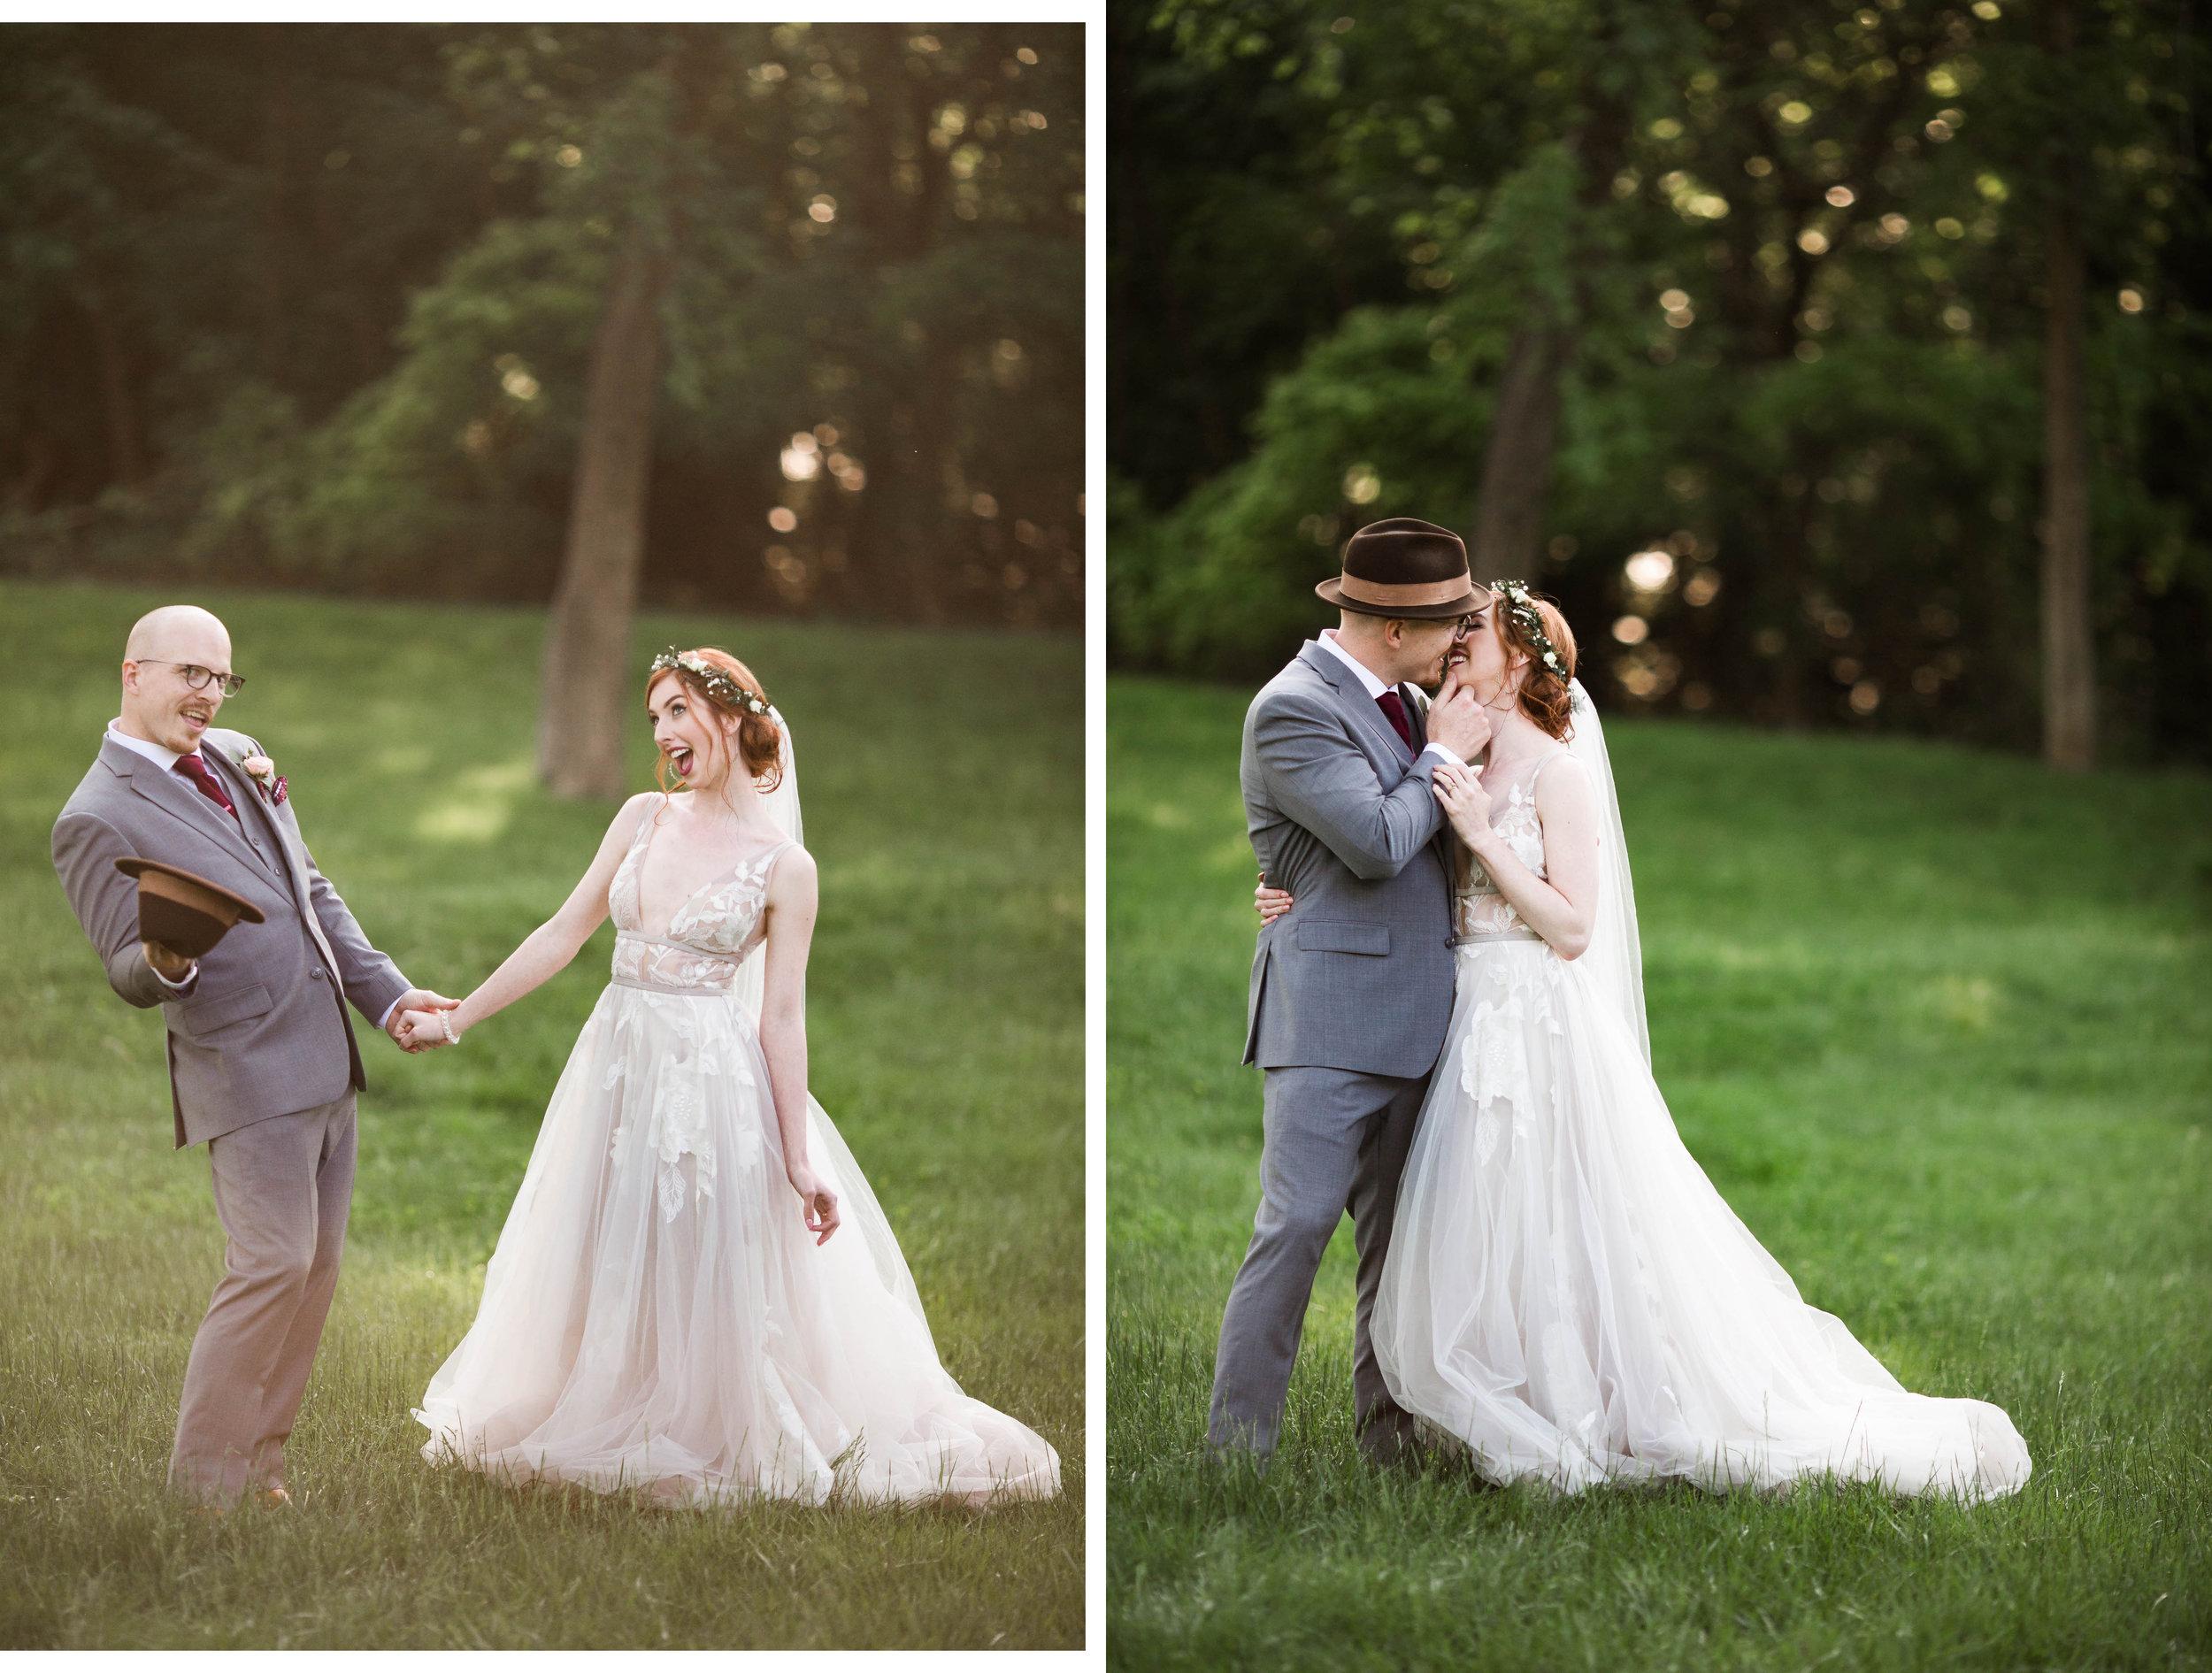 armstrong-wedding-544-edit.jpg